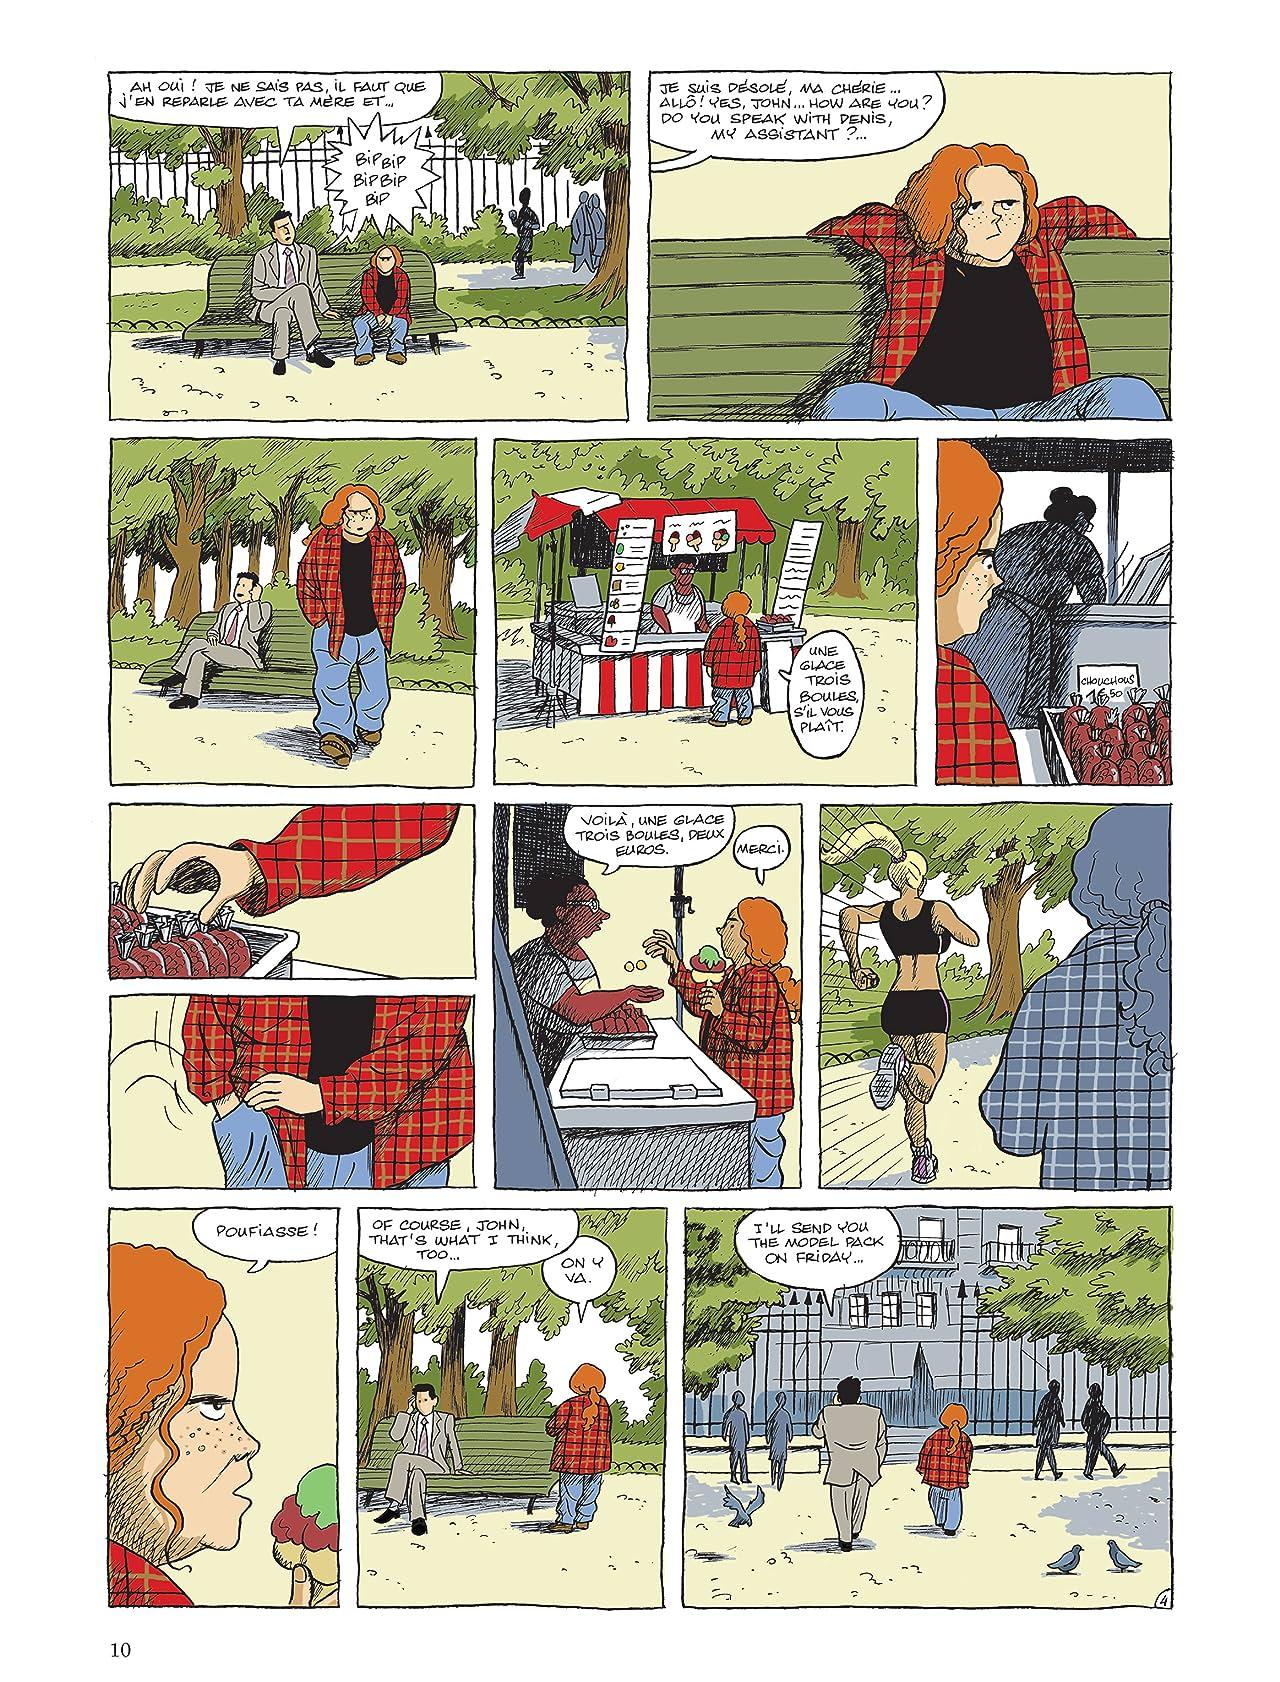 Mardon, l'intégrale: Pauvre Jean-Pierre